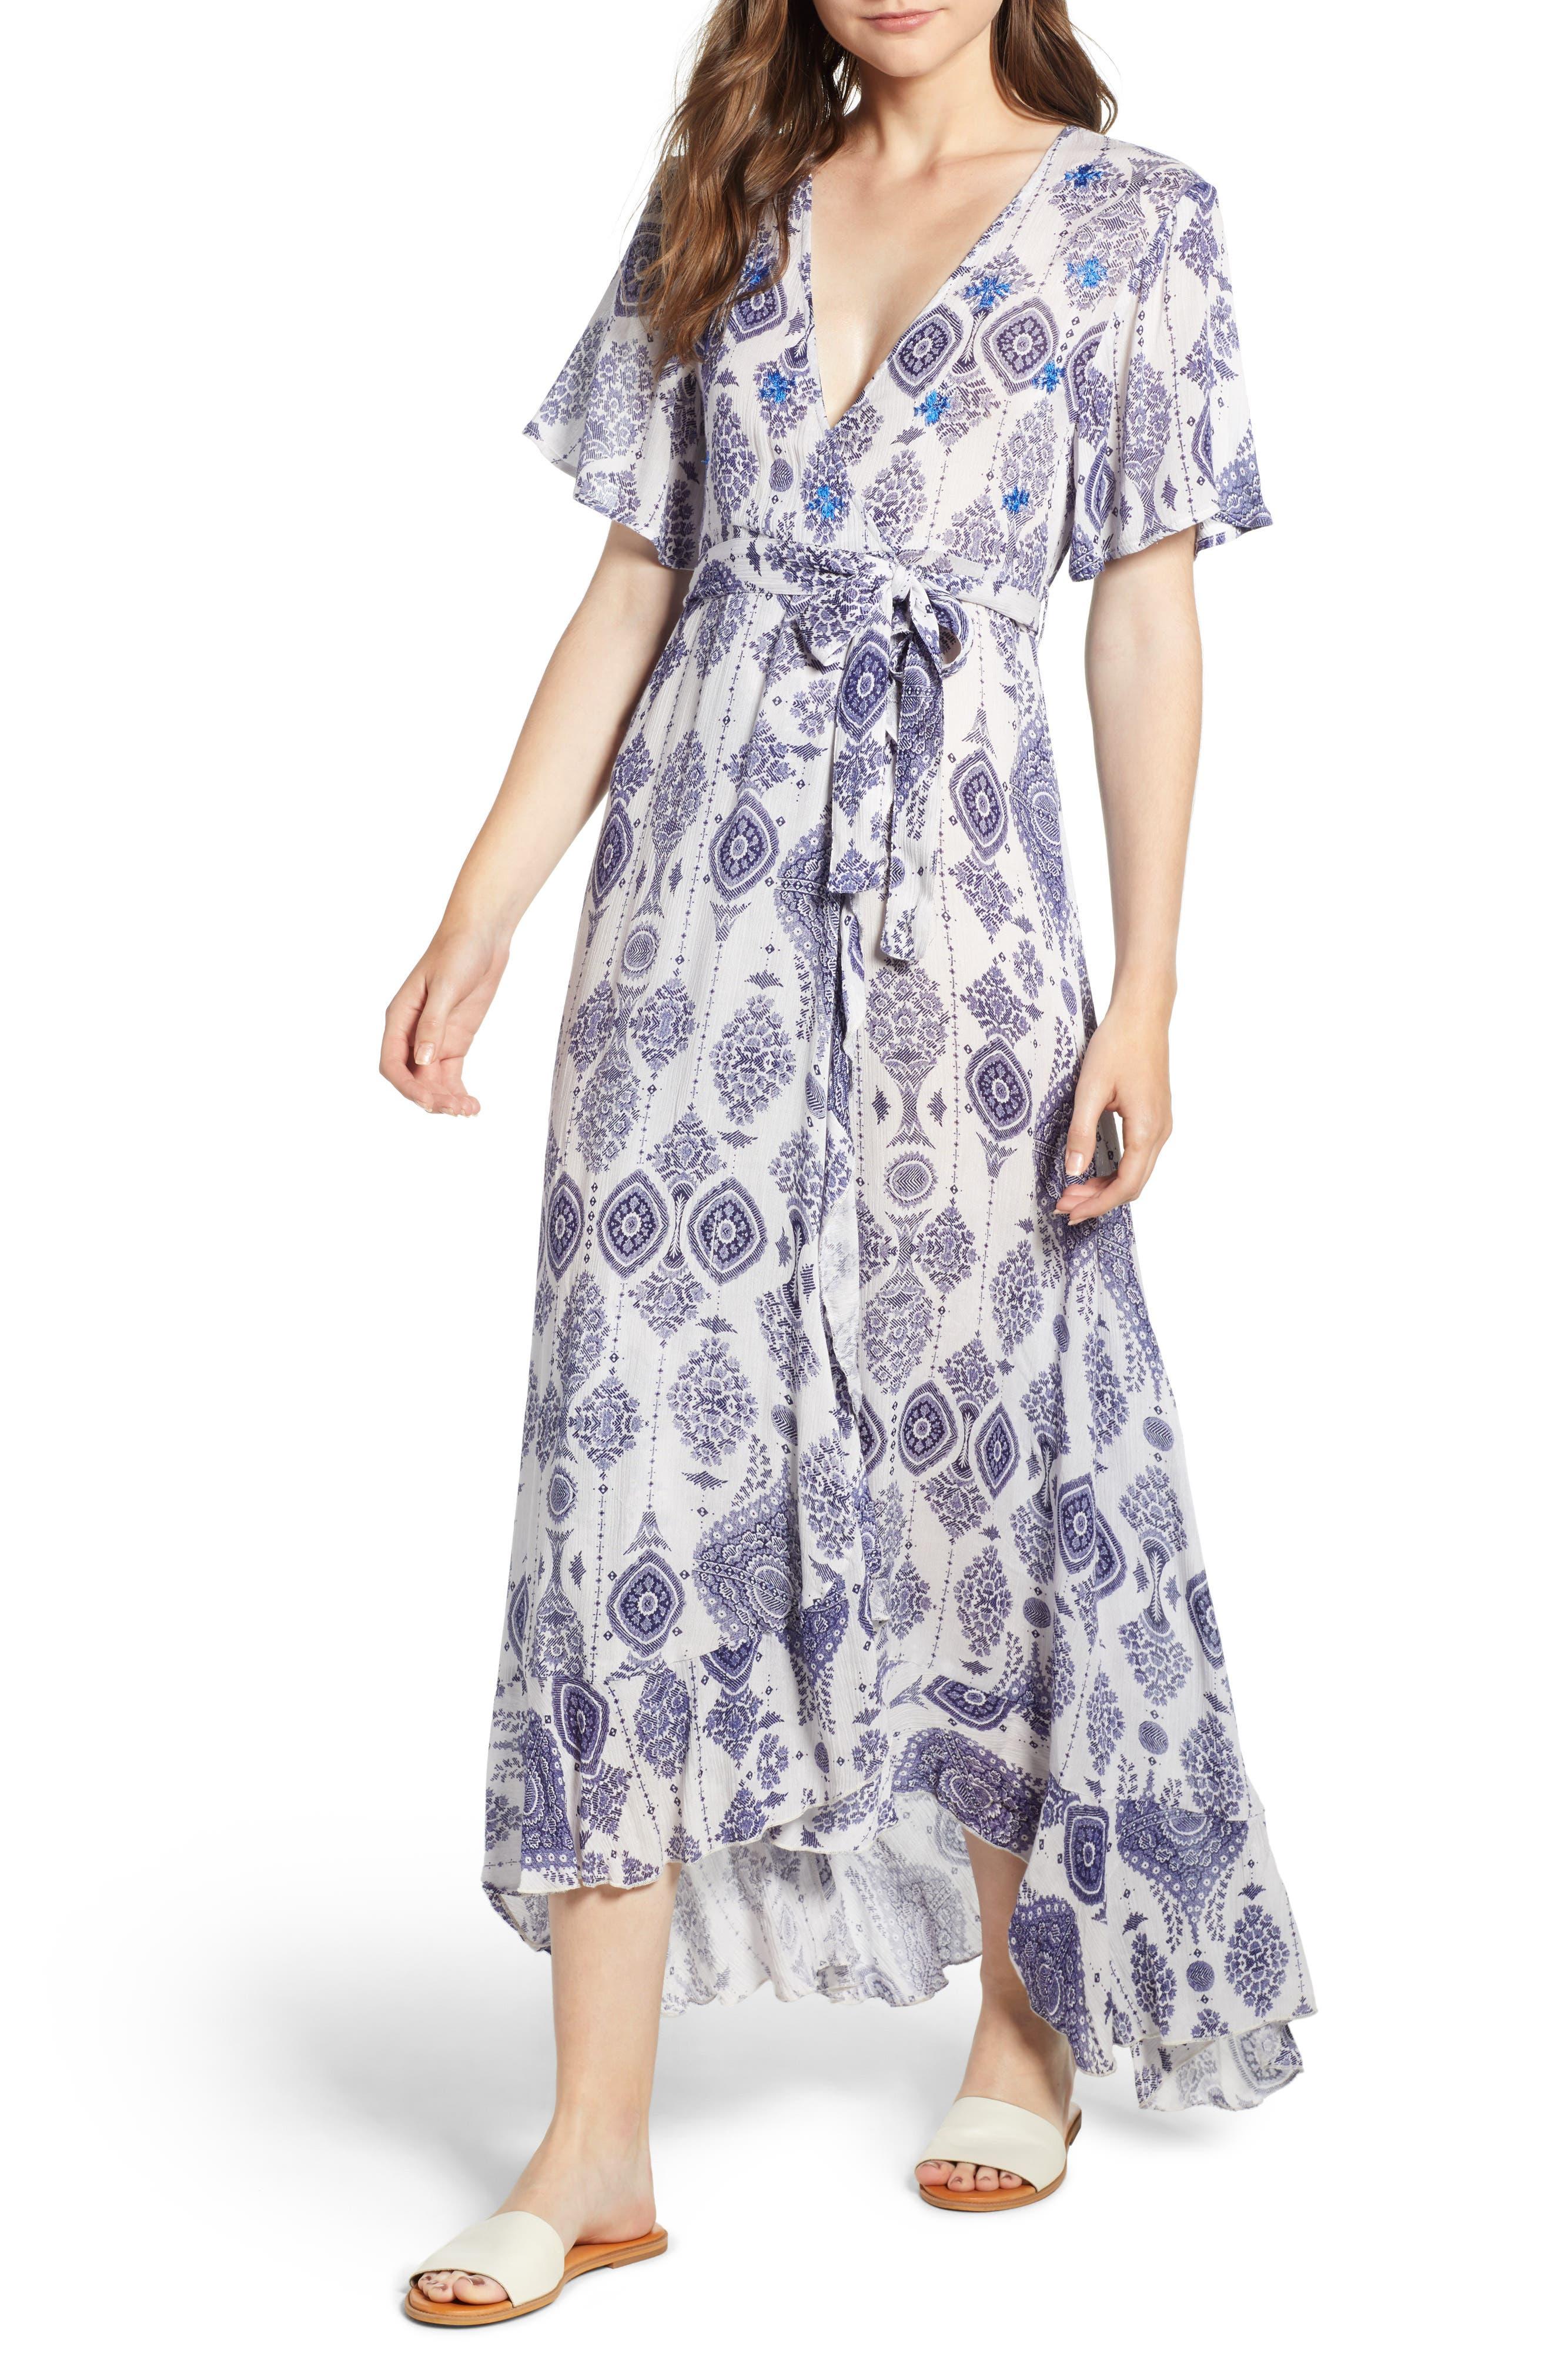 Andrea Maxi Dress,                         Main,                         color, Blue/ White